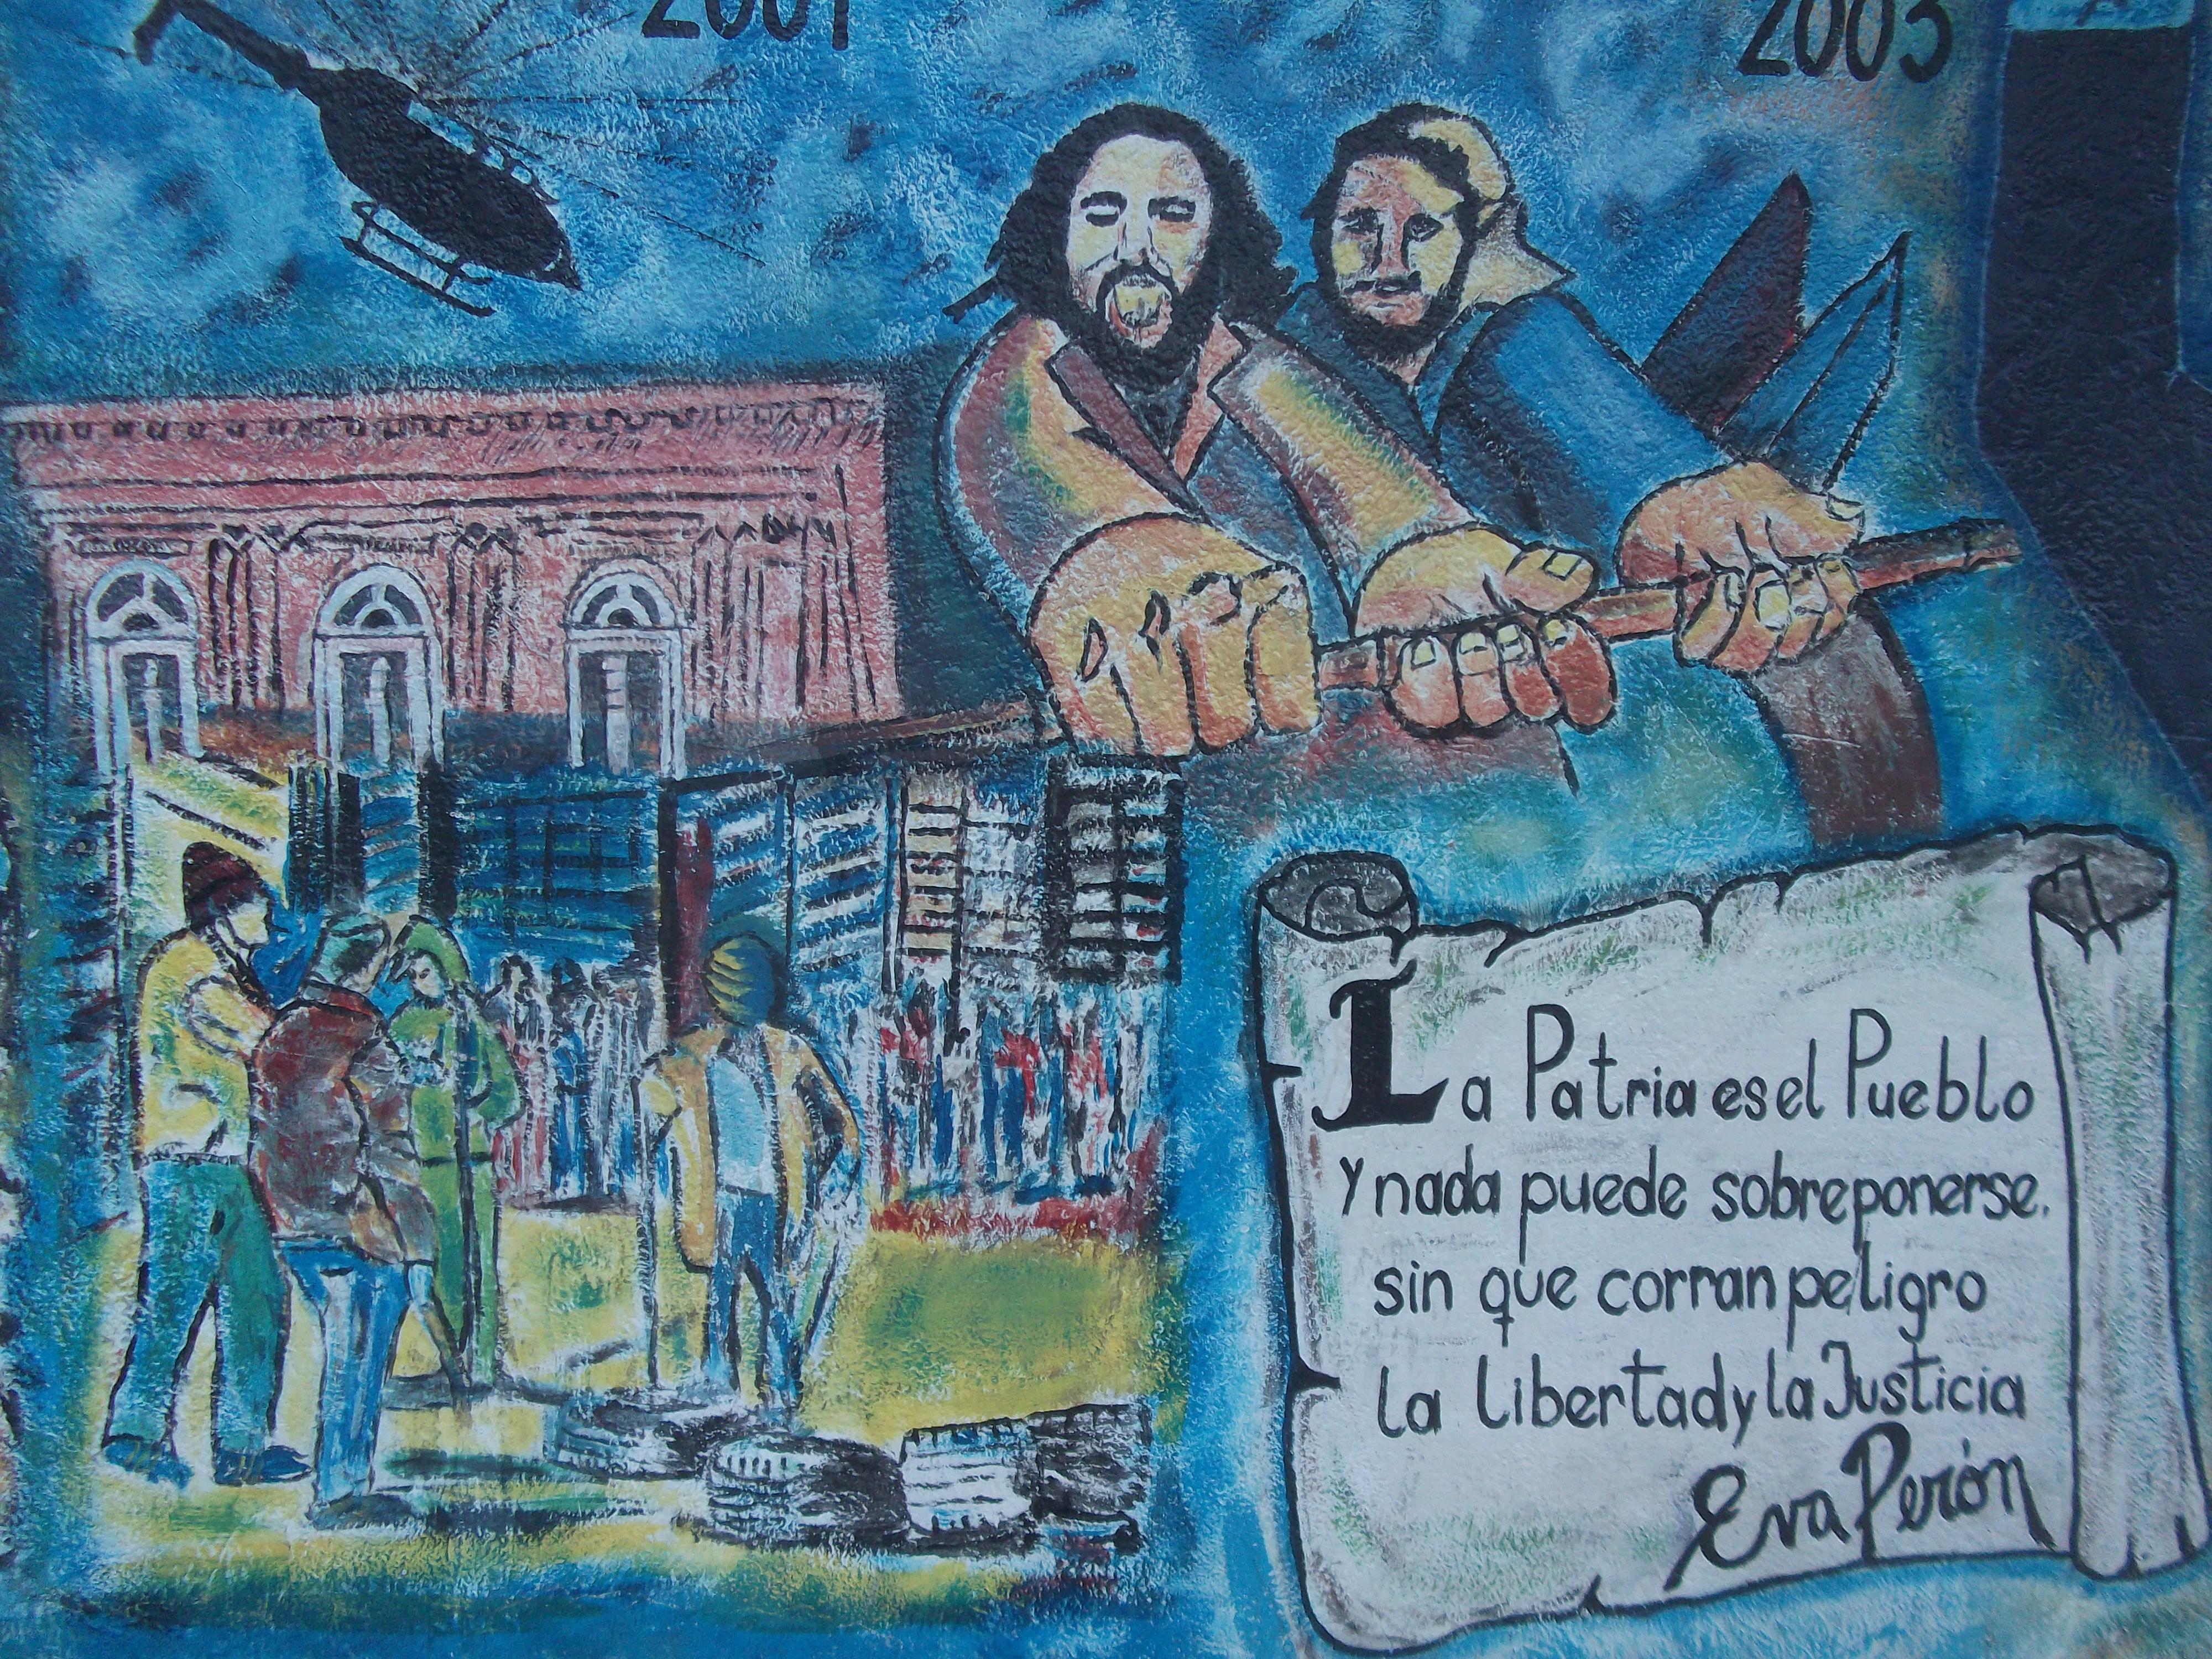 mural - Mural en Av. Gral. Lacarra al 1500